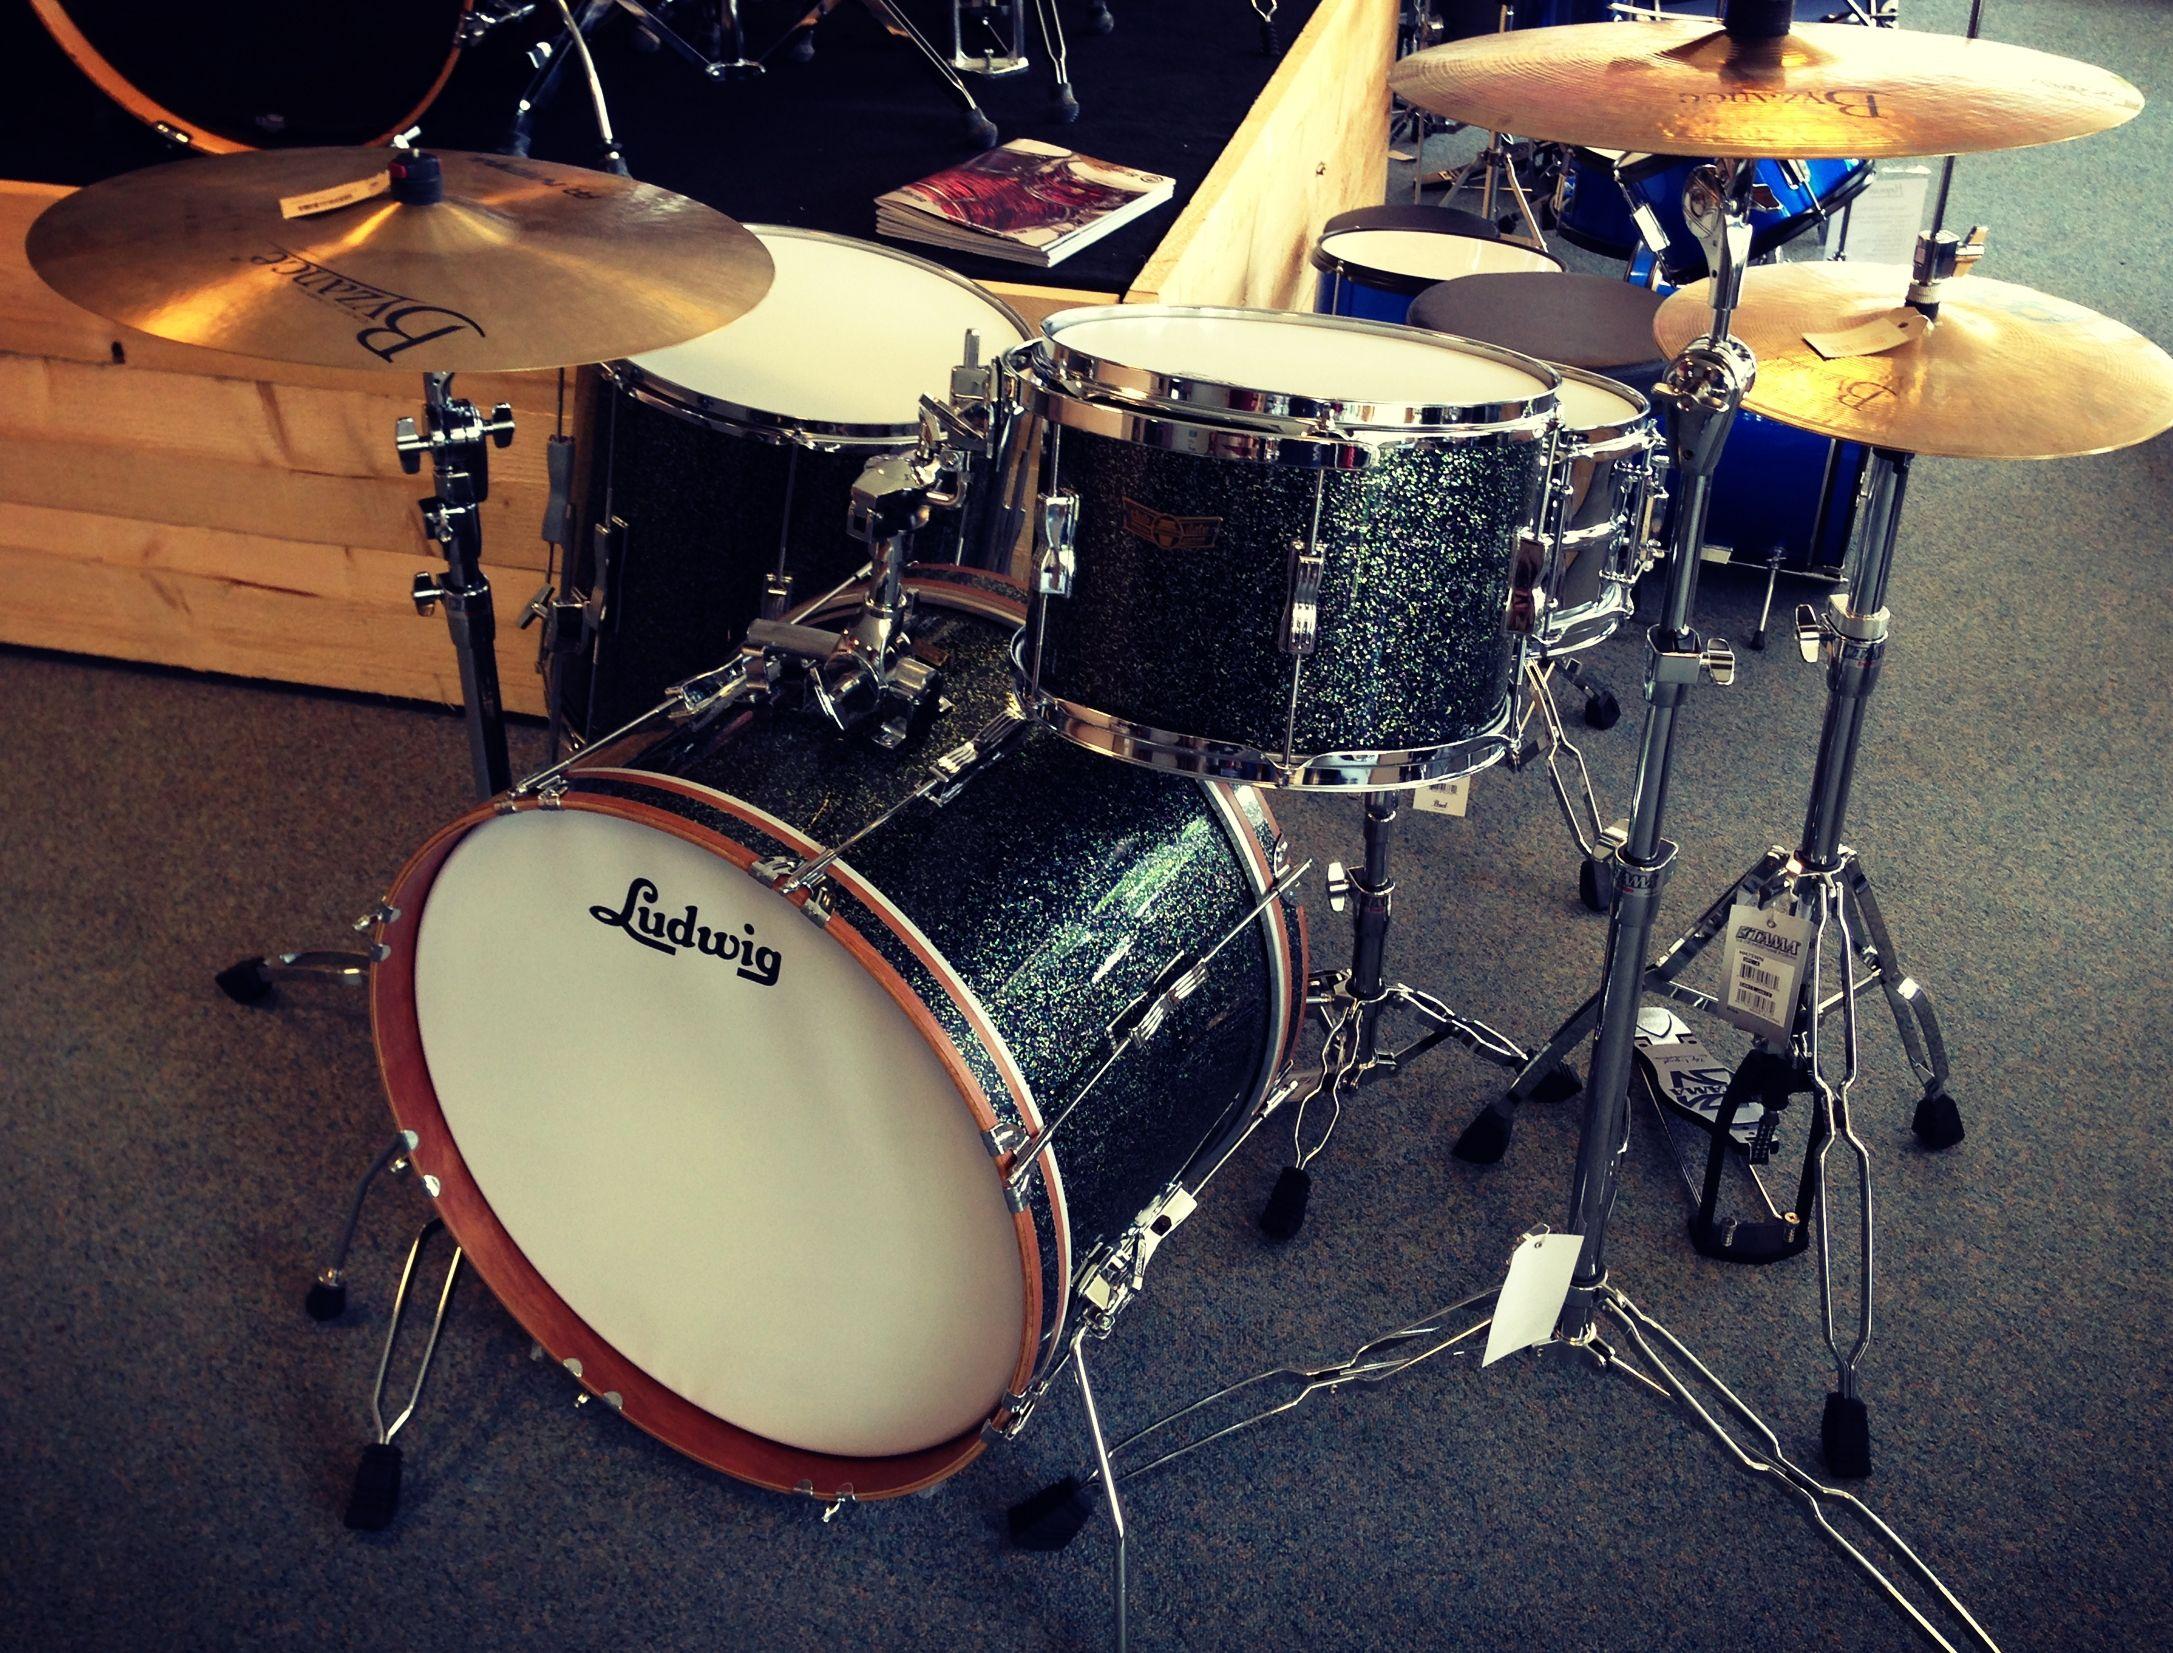 "Net binnengekomen en demoklaar in onze winkel...deze Ludwig-Musser Drums and Percussion Club Date SE Fab3. Waanzinnige kit. Door ons samengesteld tot complete setup, die bestaat uit: - 22x14"" bassdrum - 13x9"" tom - 16x16"" floortom - 14x6,5"" Ludwig Supralite snare - Tama HP5WN hardware pack (snare stand, hi-hat stand, 2x boom stand, Iron Cobra bassdrumpedal) Gumwood / Cherry shells, Olive Green Sparkle wrap finish"